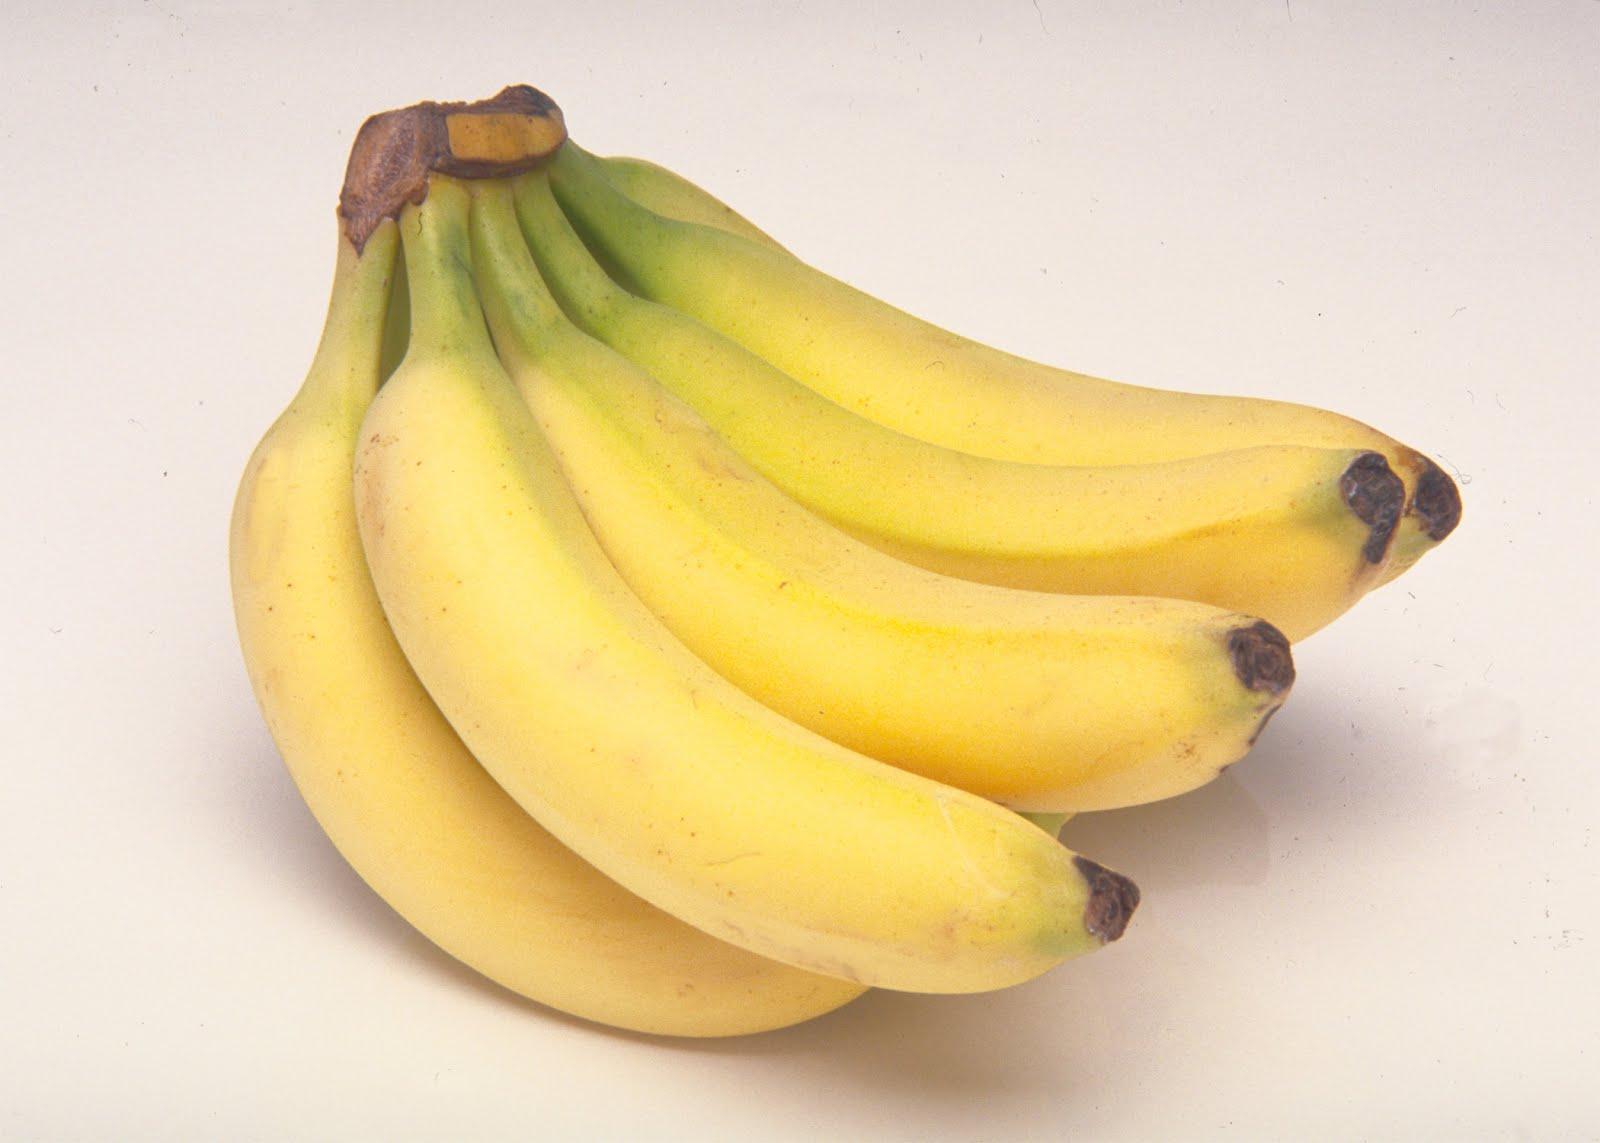 makanan yang dapat memperkuat kembali alat vital pria